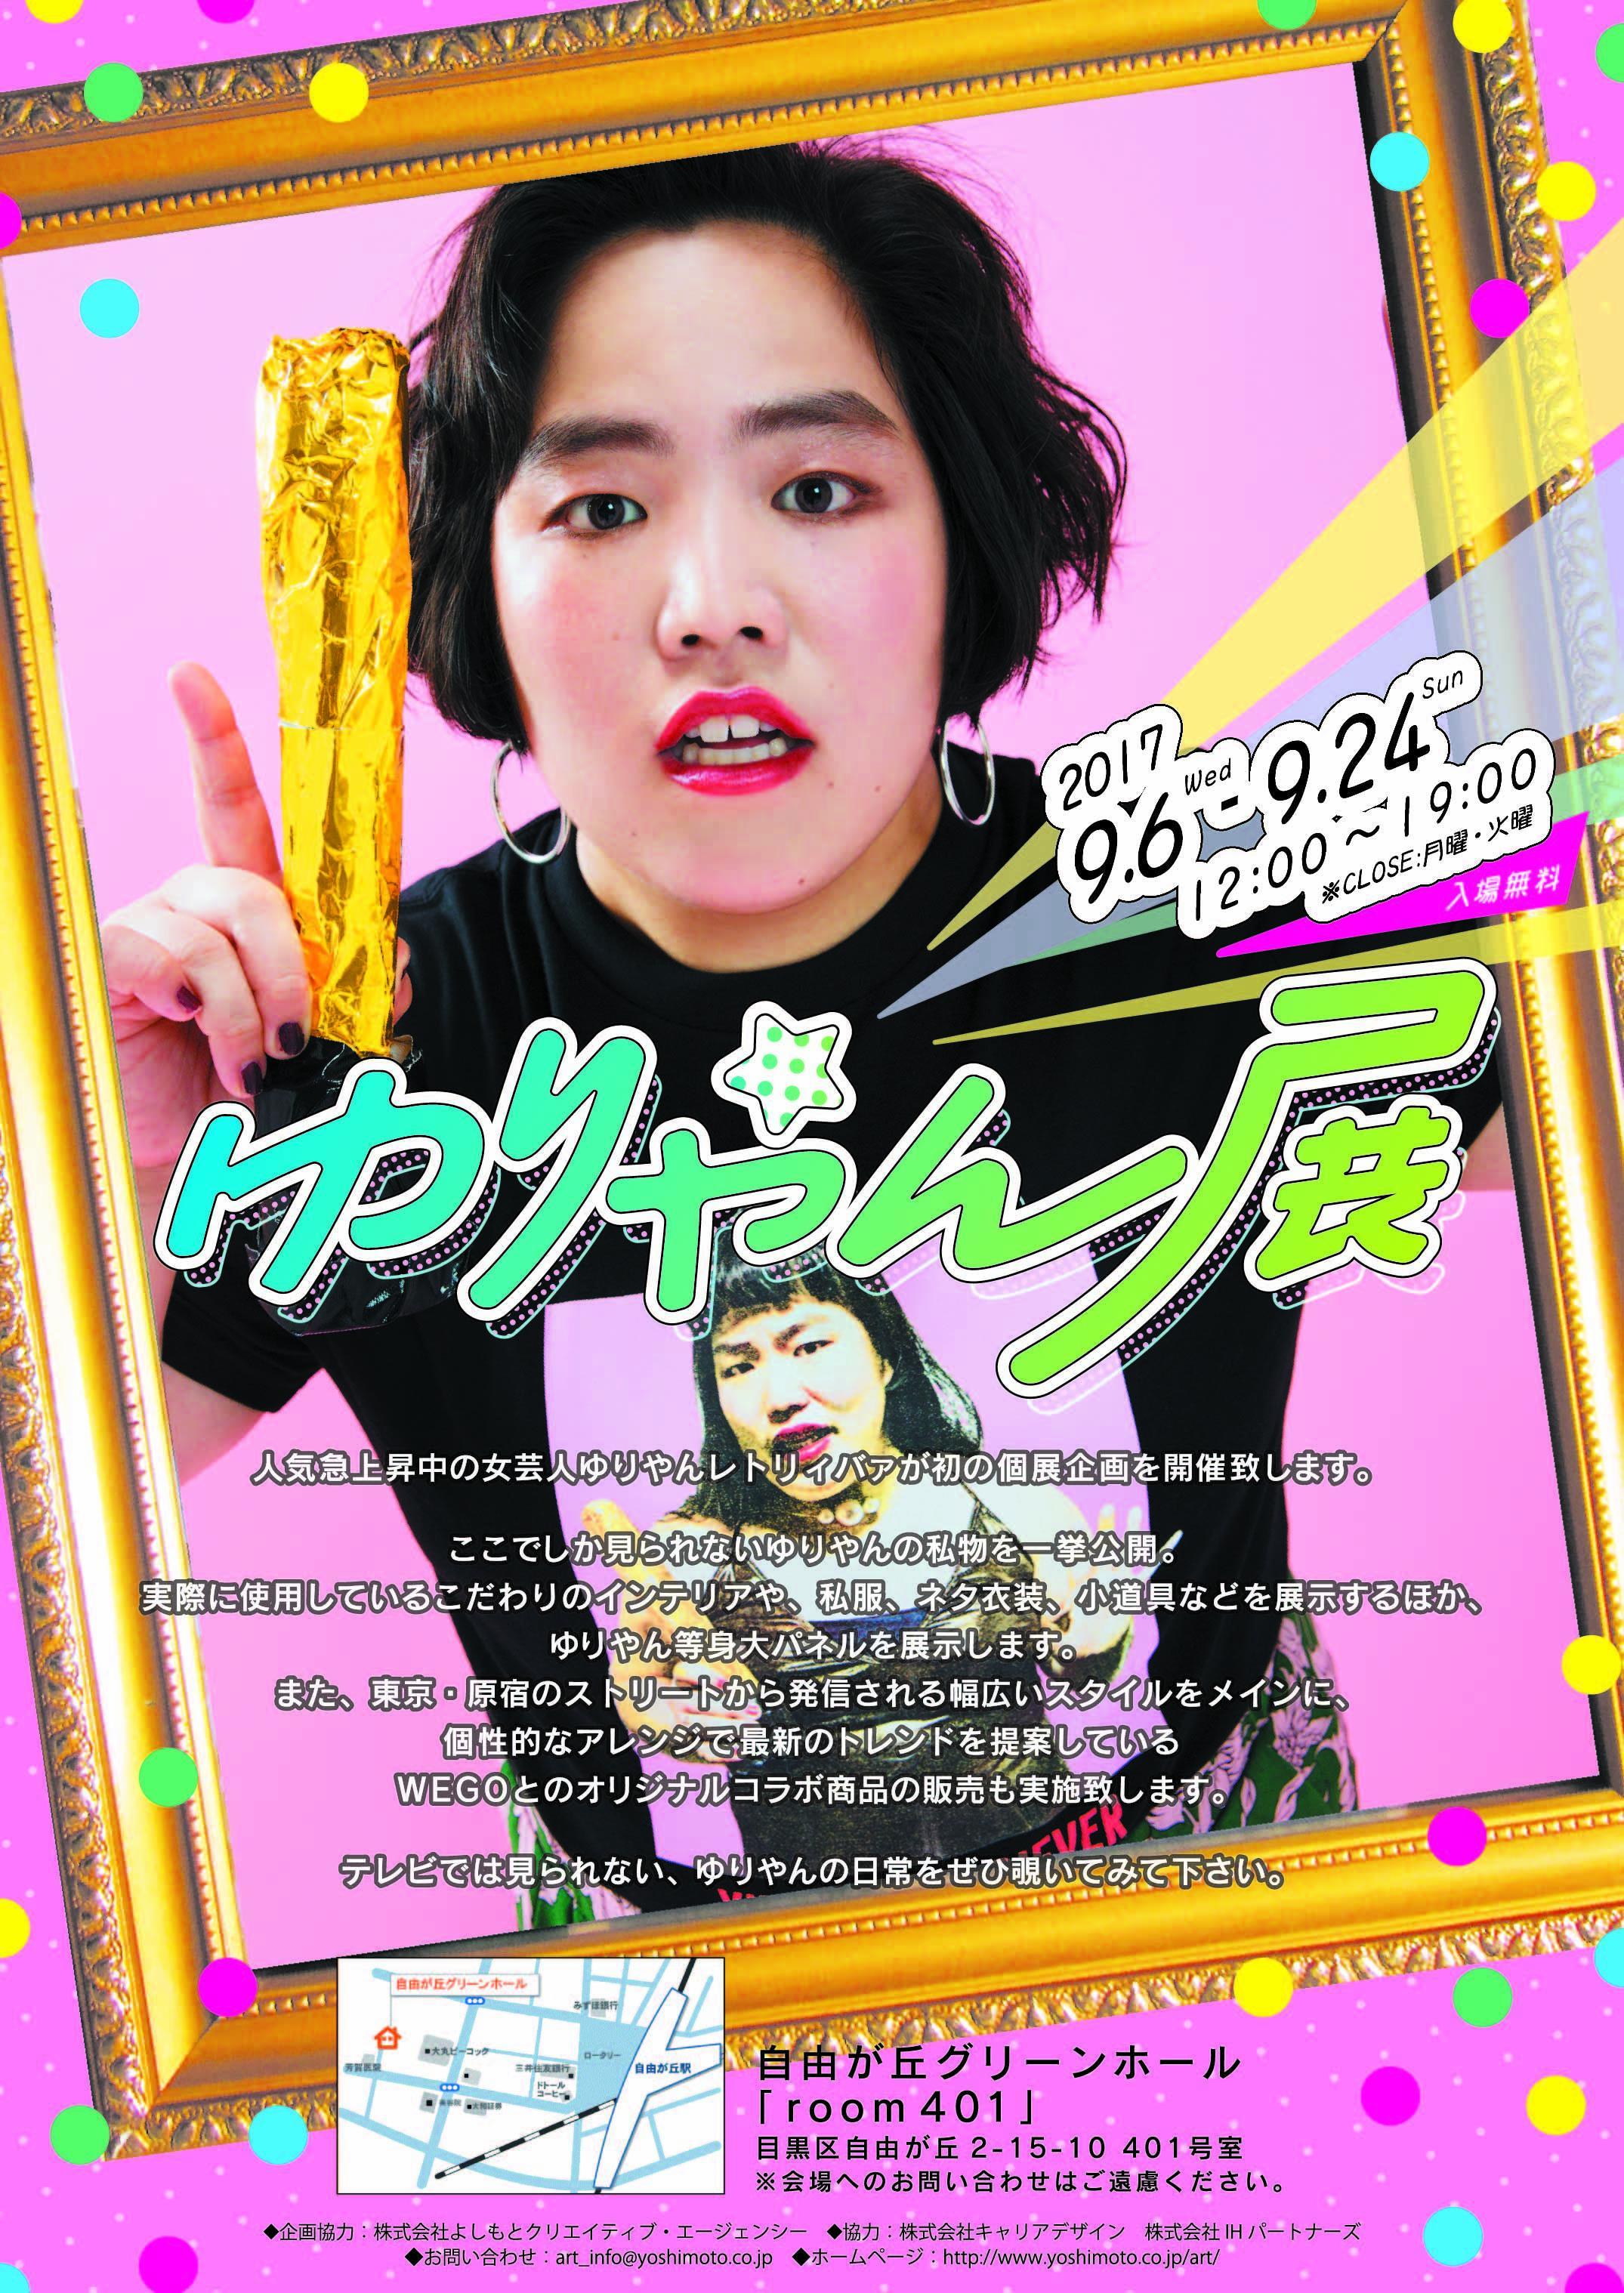 http://news.yoshimoto.co.jp/20170907113156-a99aeab05e99bc33bee2aca2c19606448b047afe.jpg